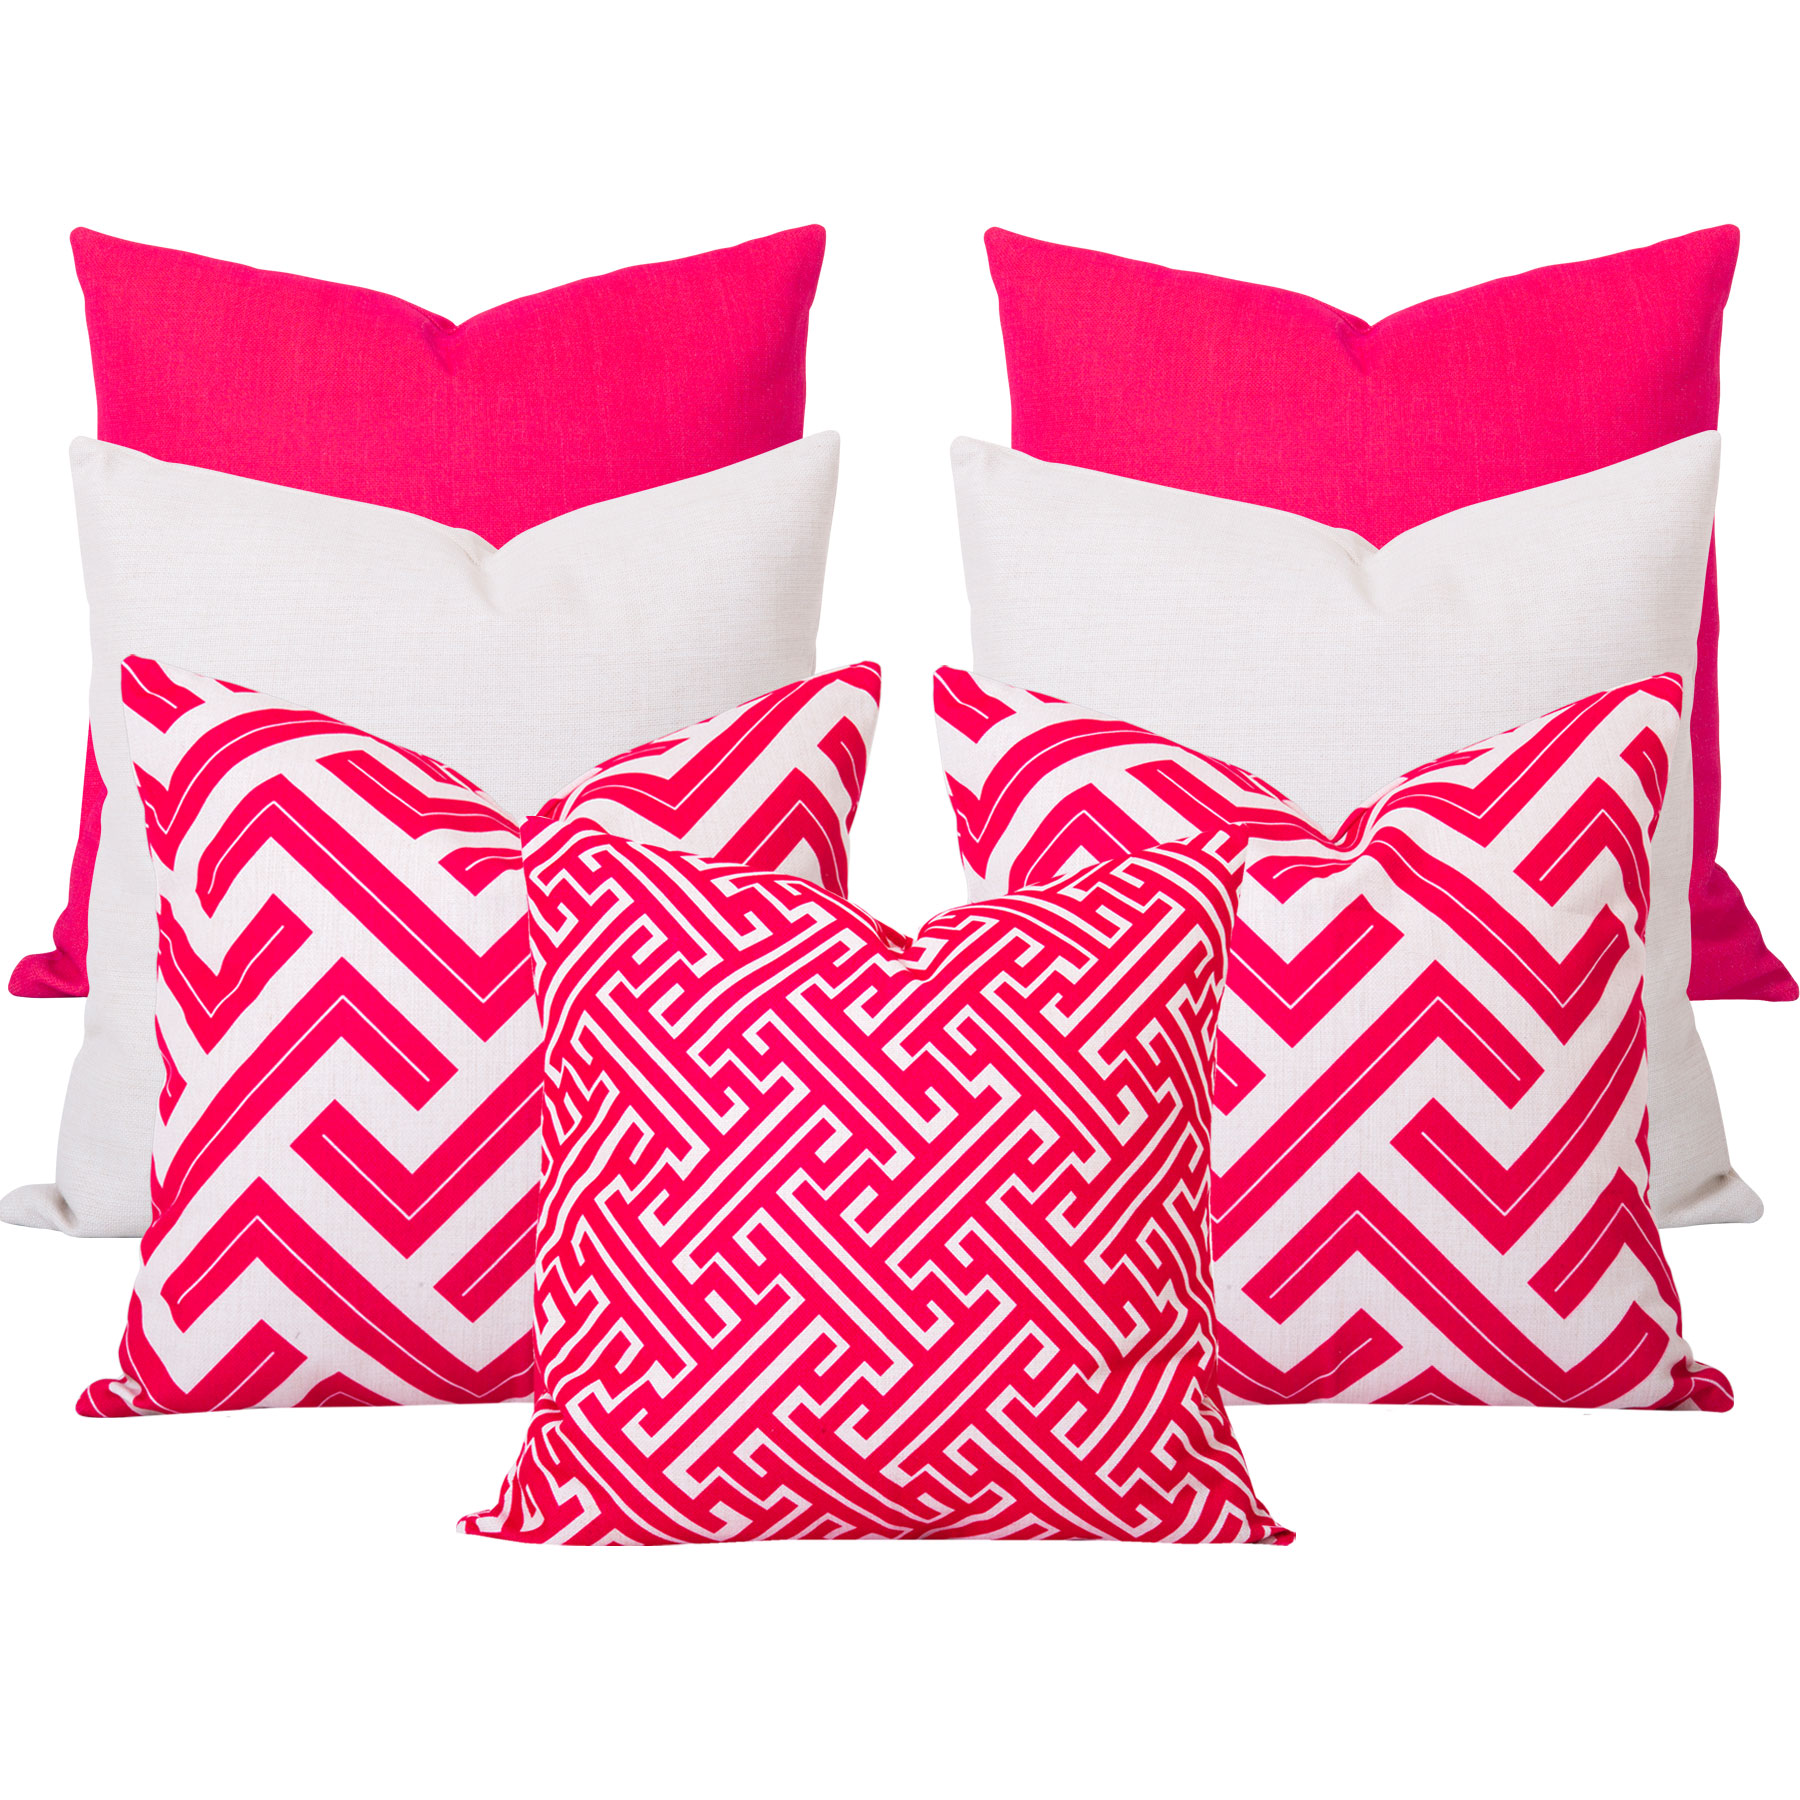 Georgia-Zedd-Pink-7-Cushion-Set